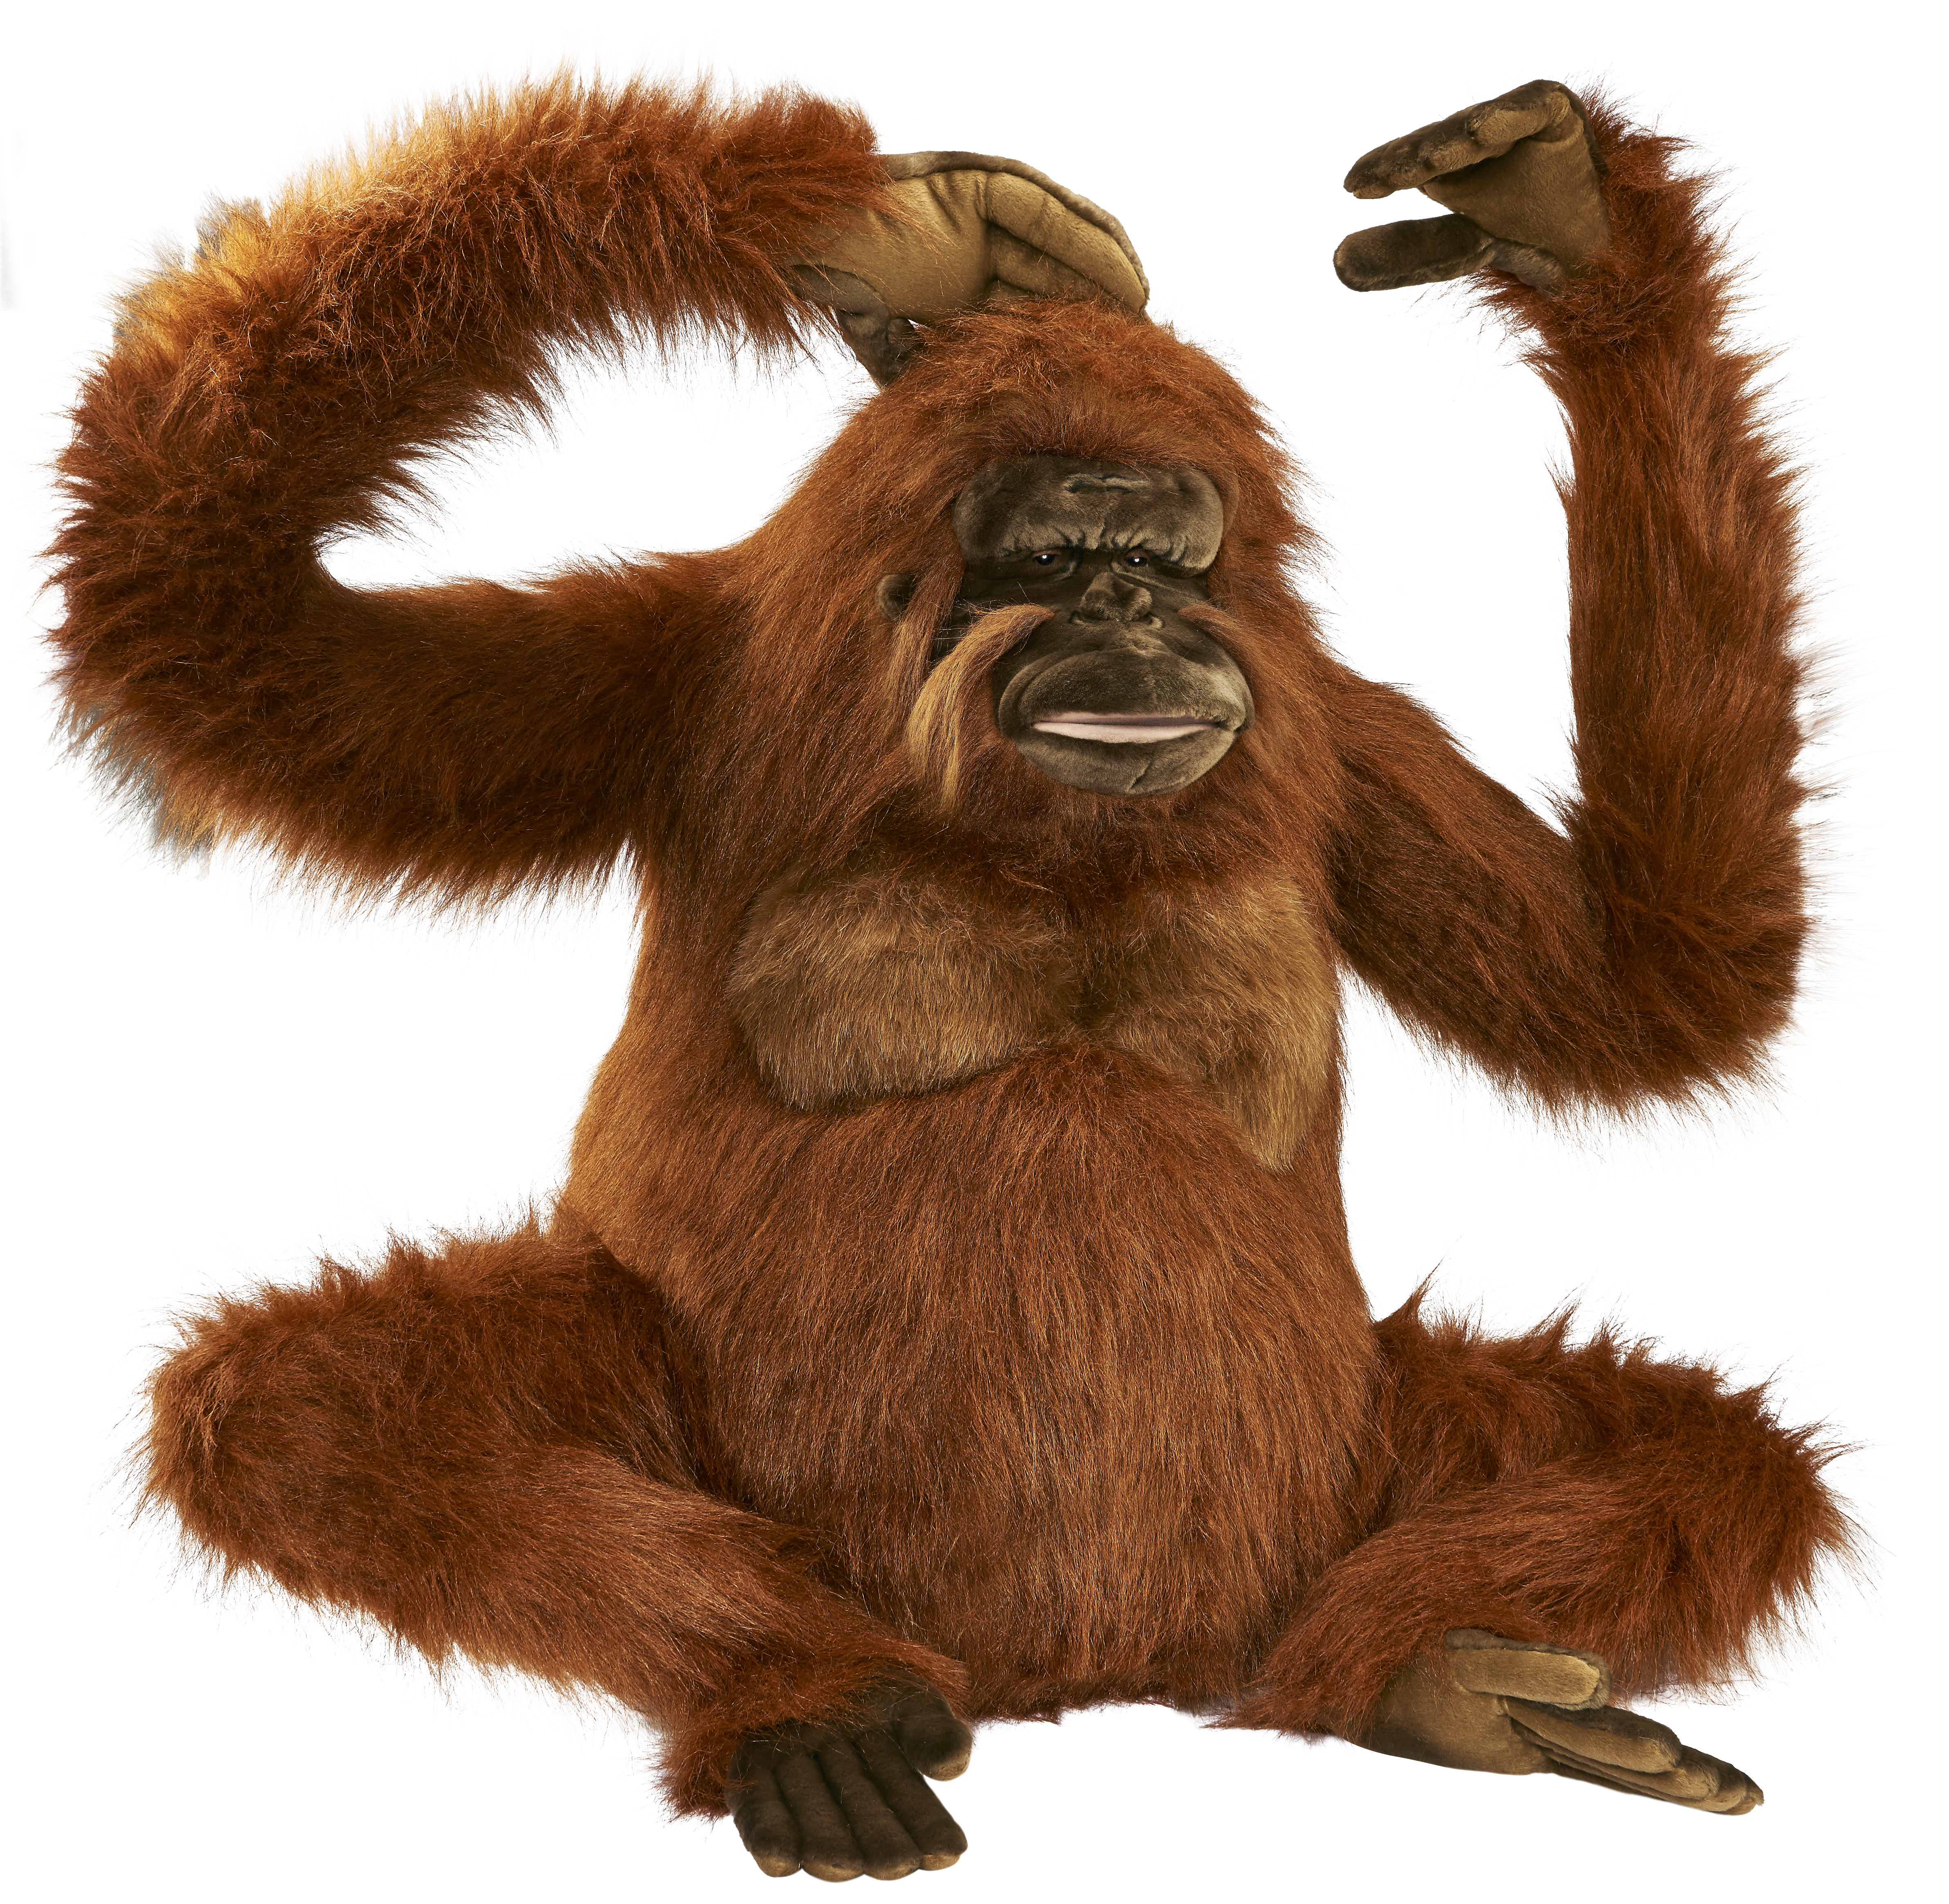 Orangutan PNG images free download.